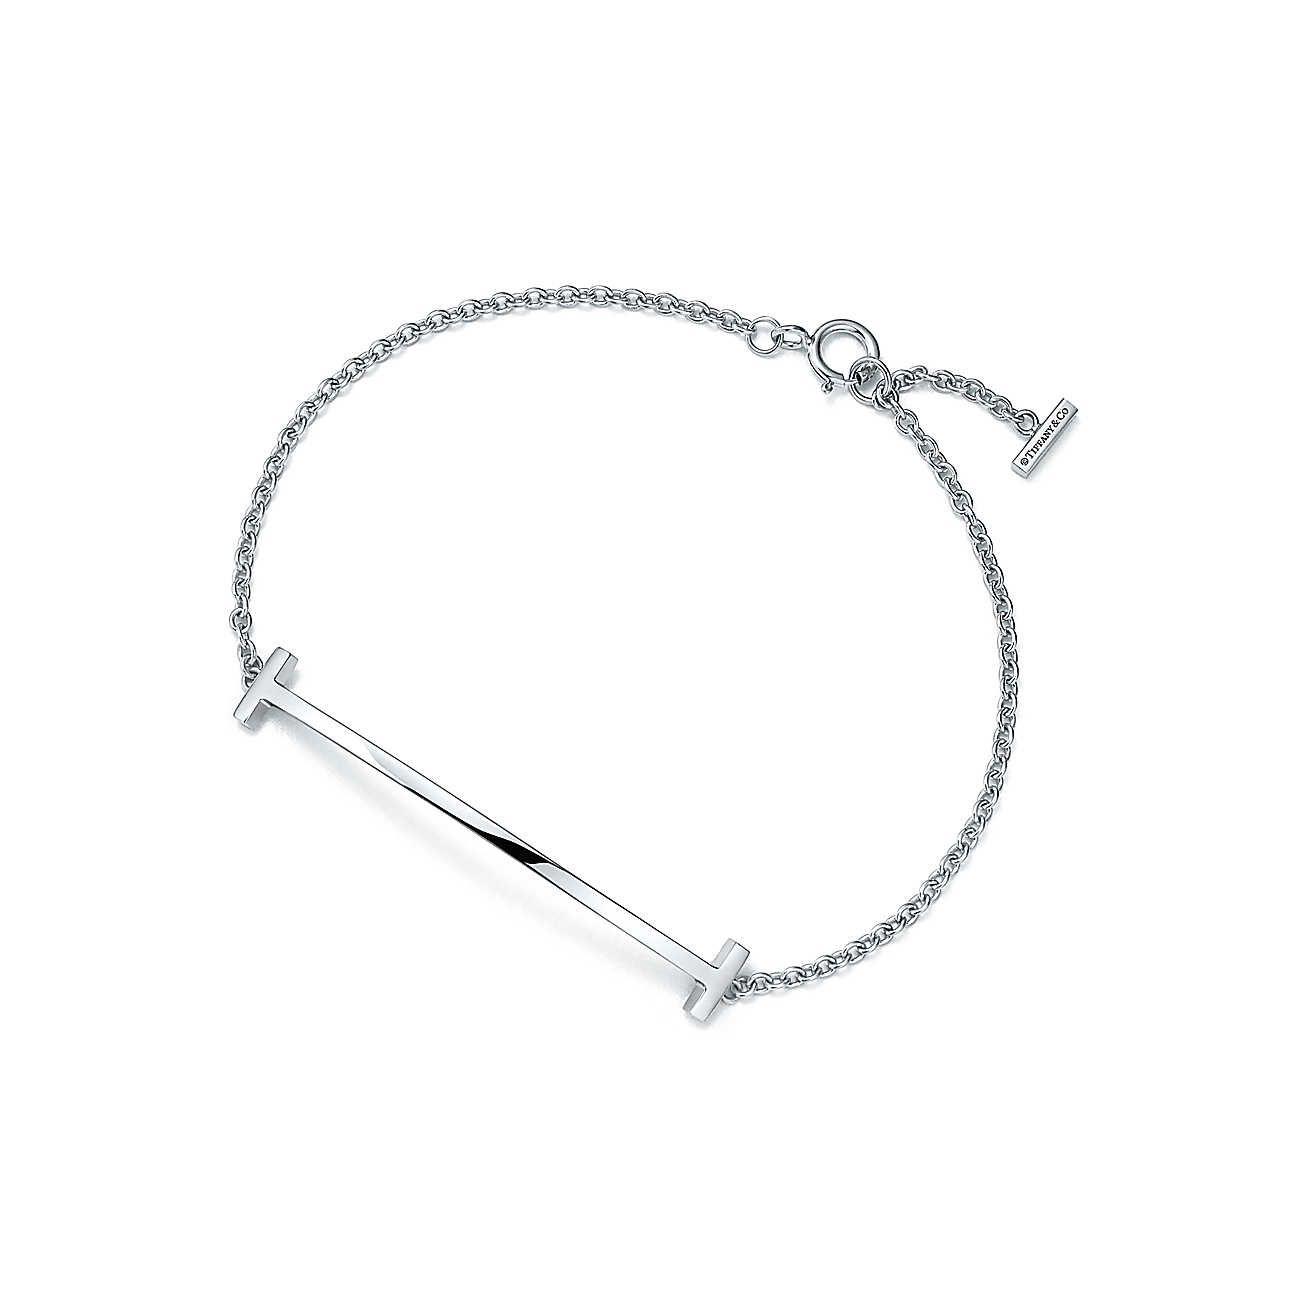 88ff345d9 Smile Bracelet | Gifts.Wishlist | Tiffany bracelets, Tiffany t, Tiffany